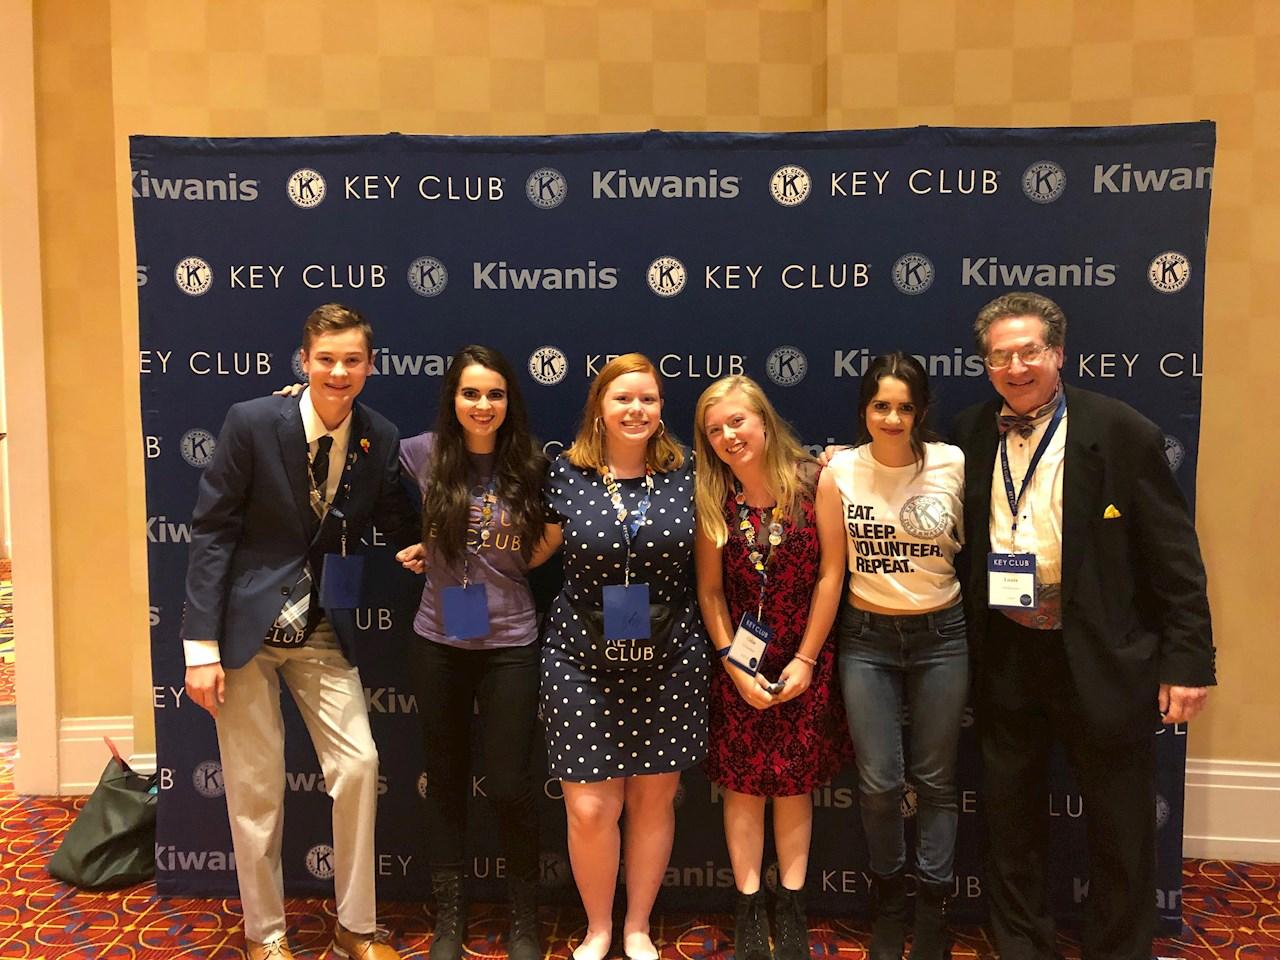 Kiwanis Club - Volunteer in Alexandria Va